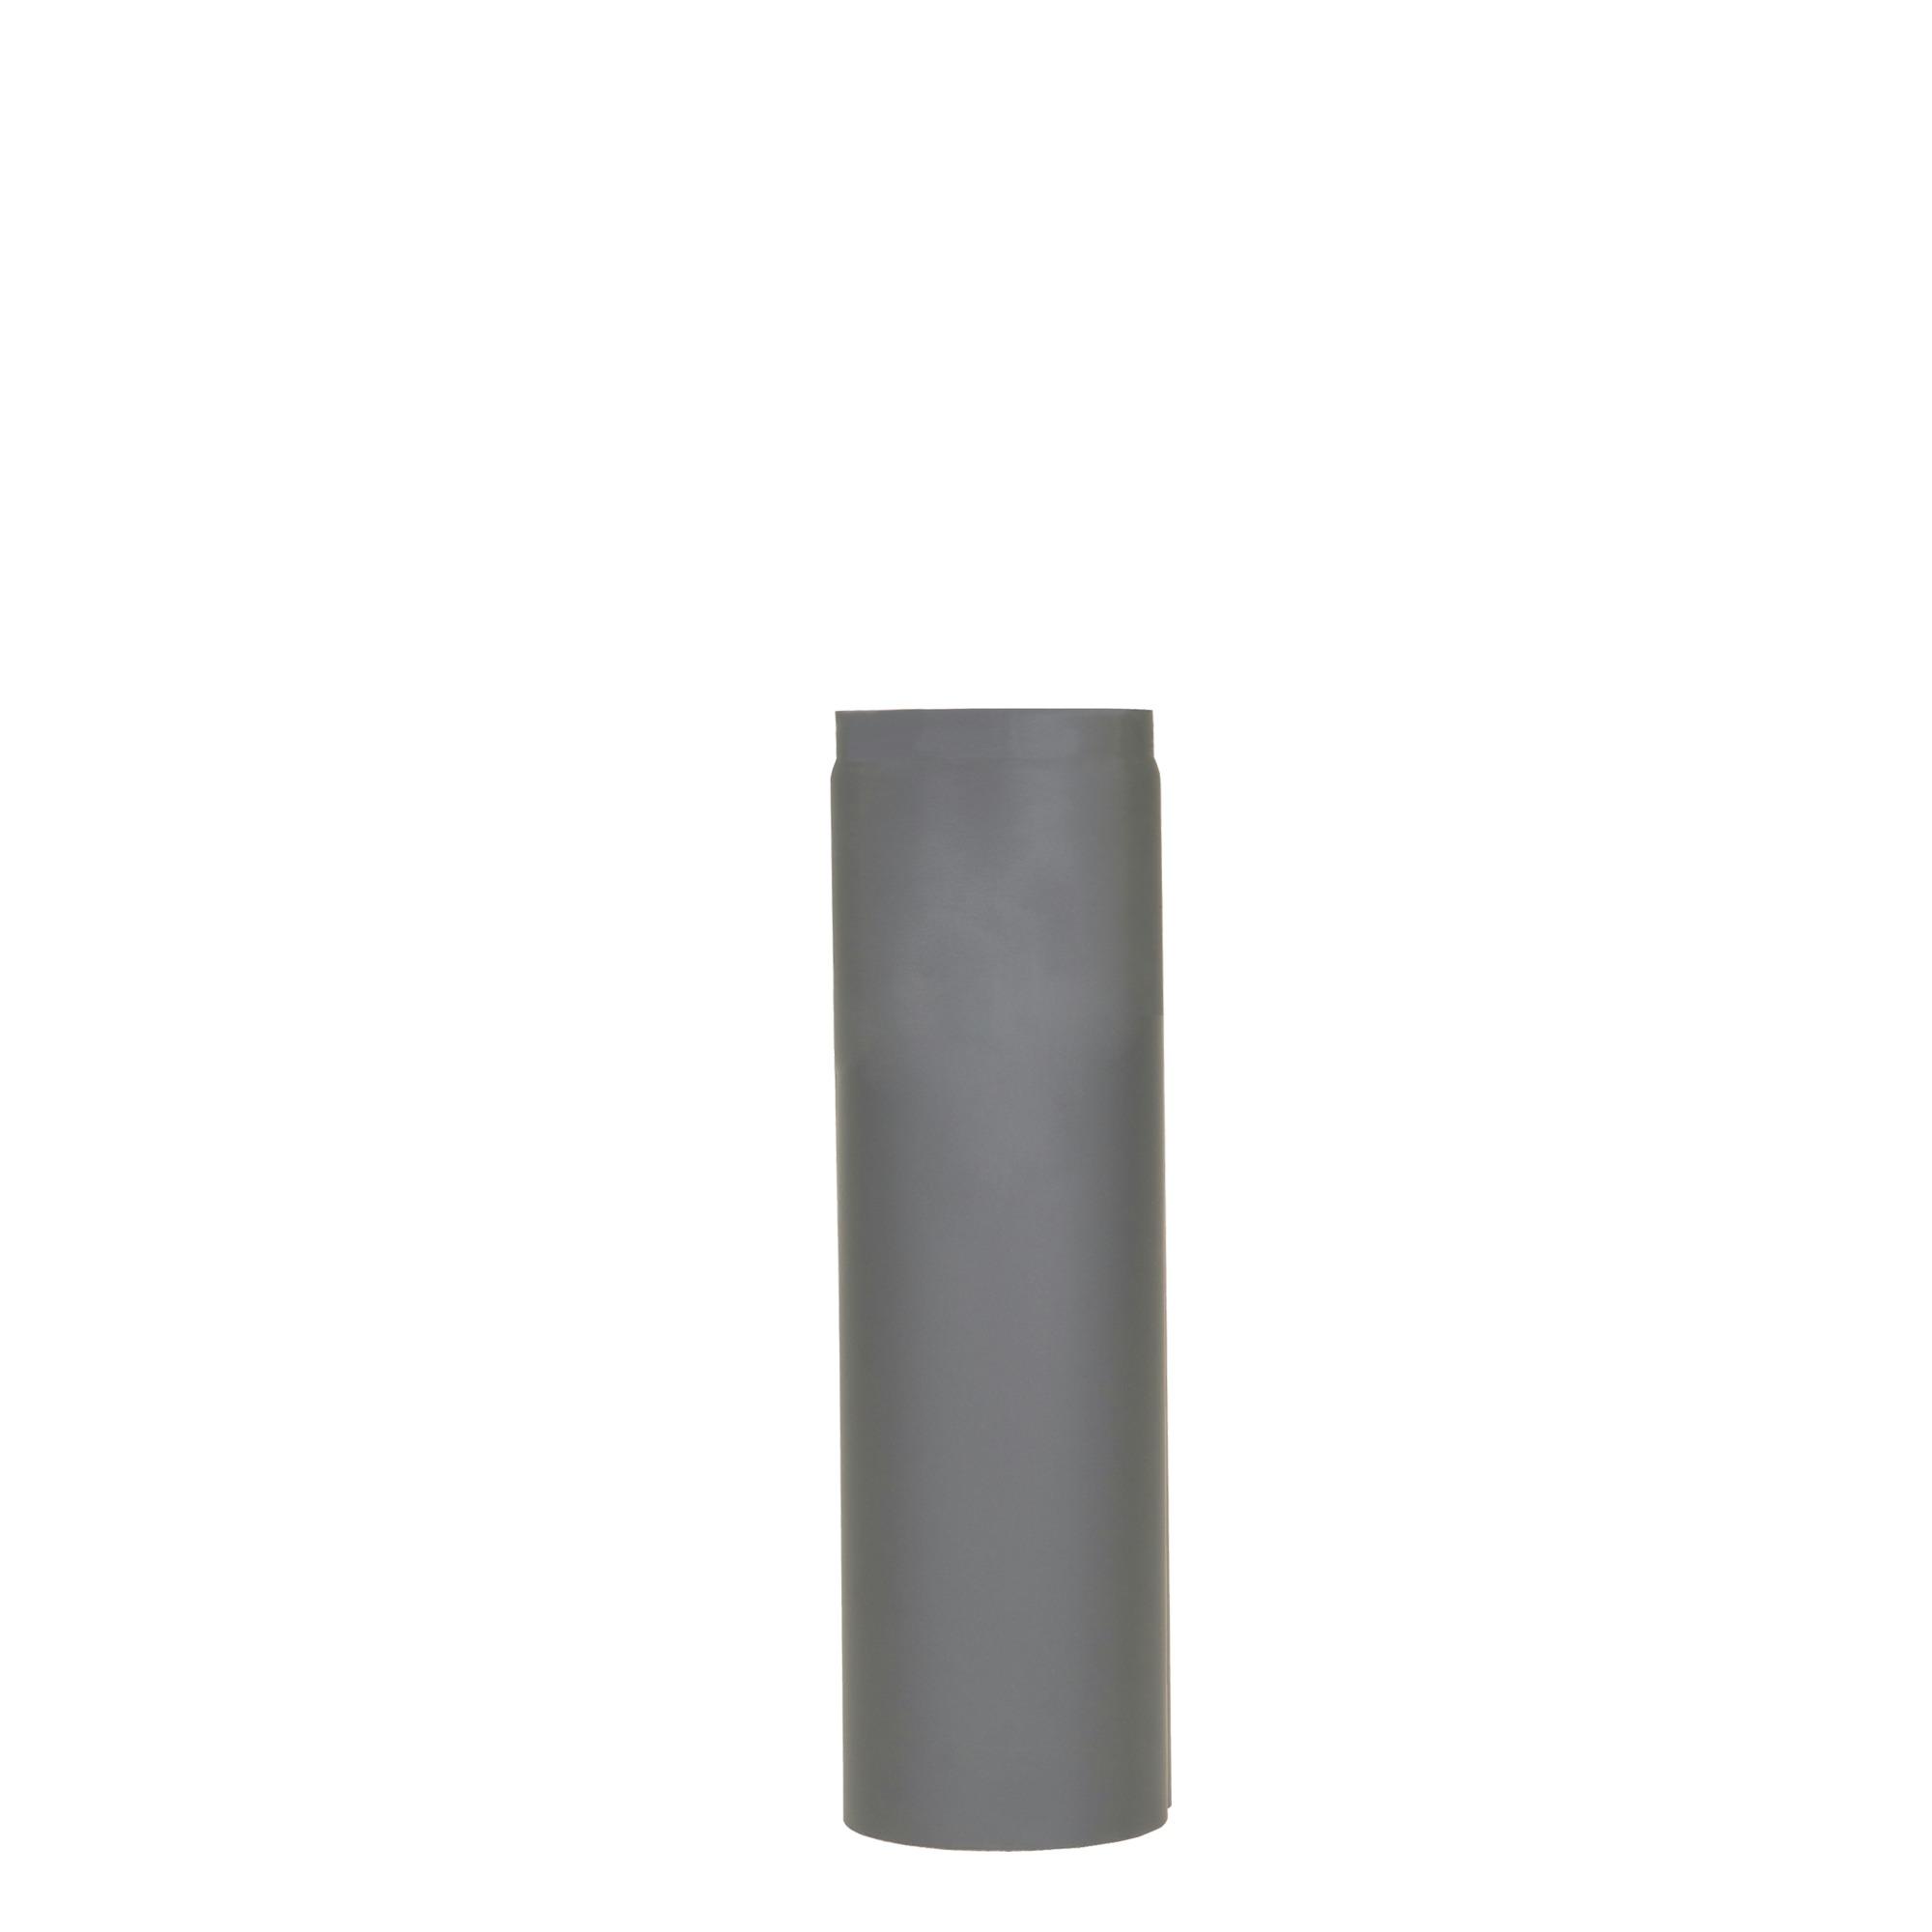 Livinflame kachelpijp enkelwandige recht 50 cm Ø 150 mm